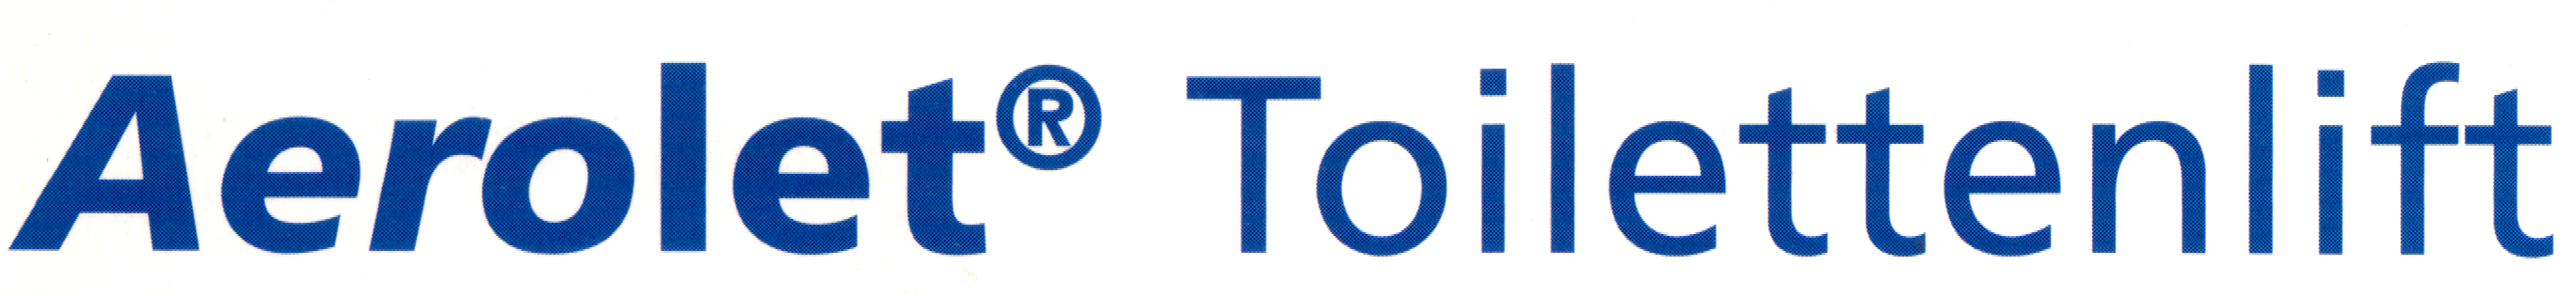 aerolet_logo